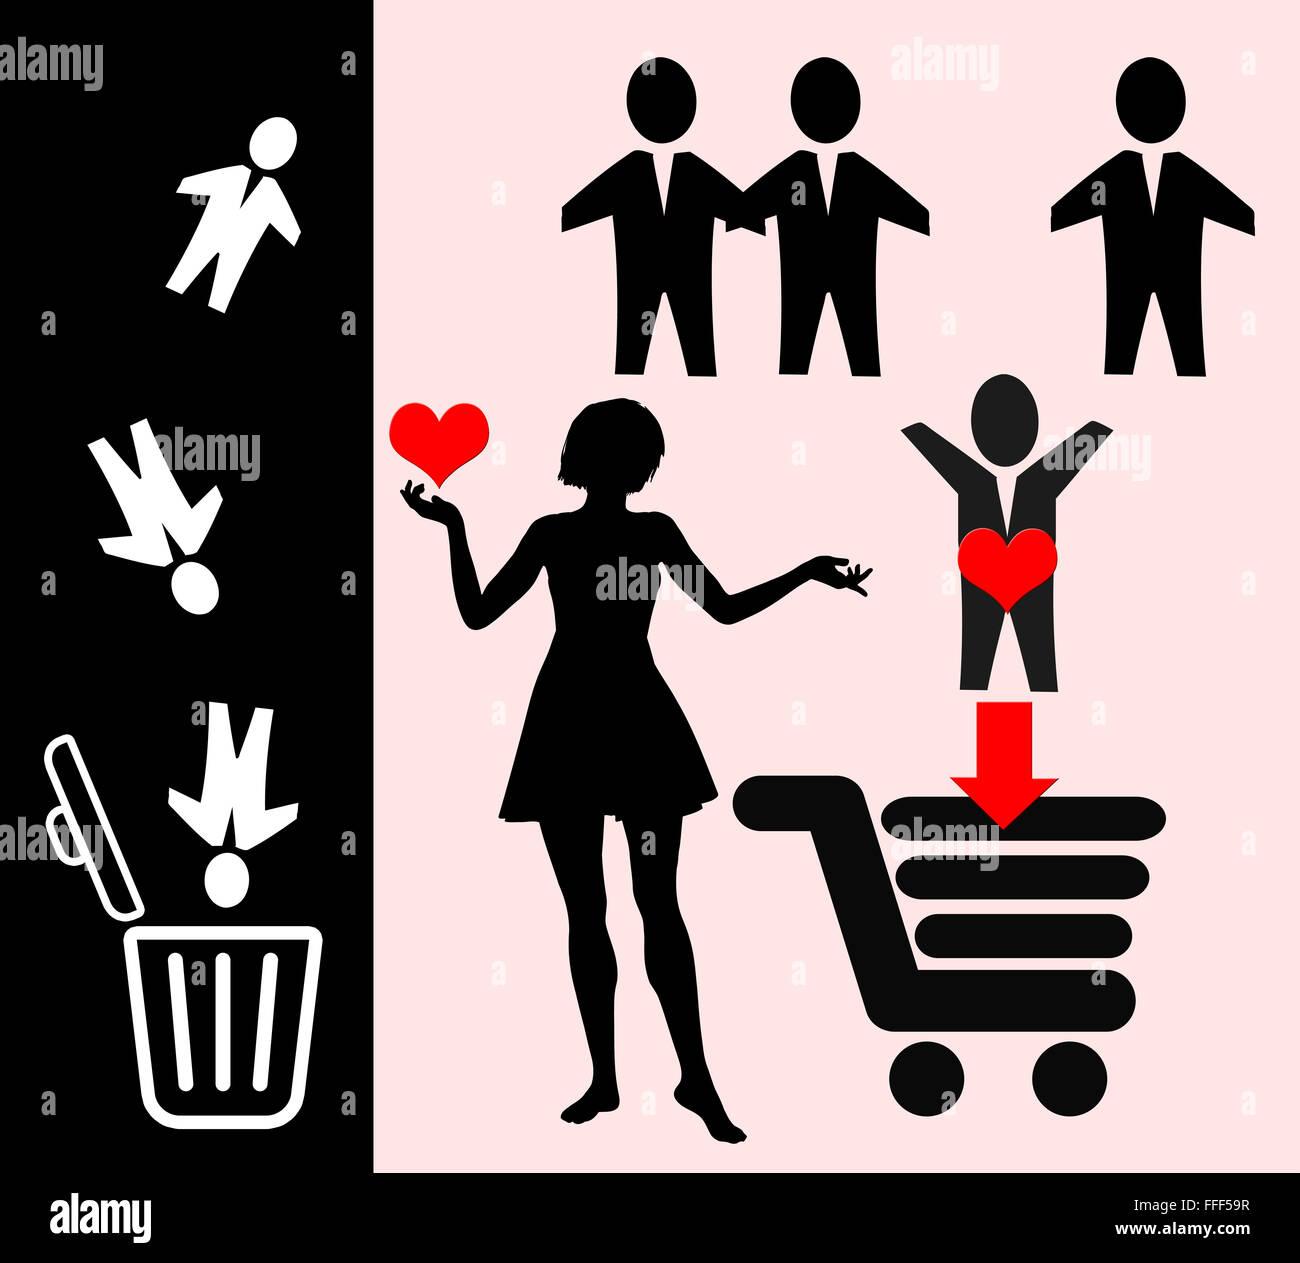 Amor en la red Imagen De Stock